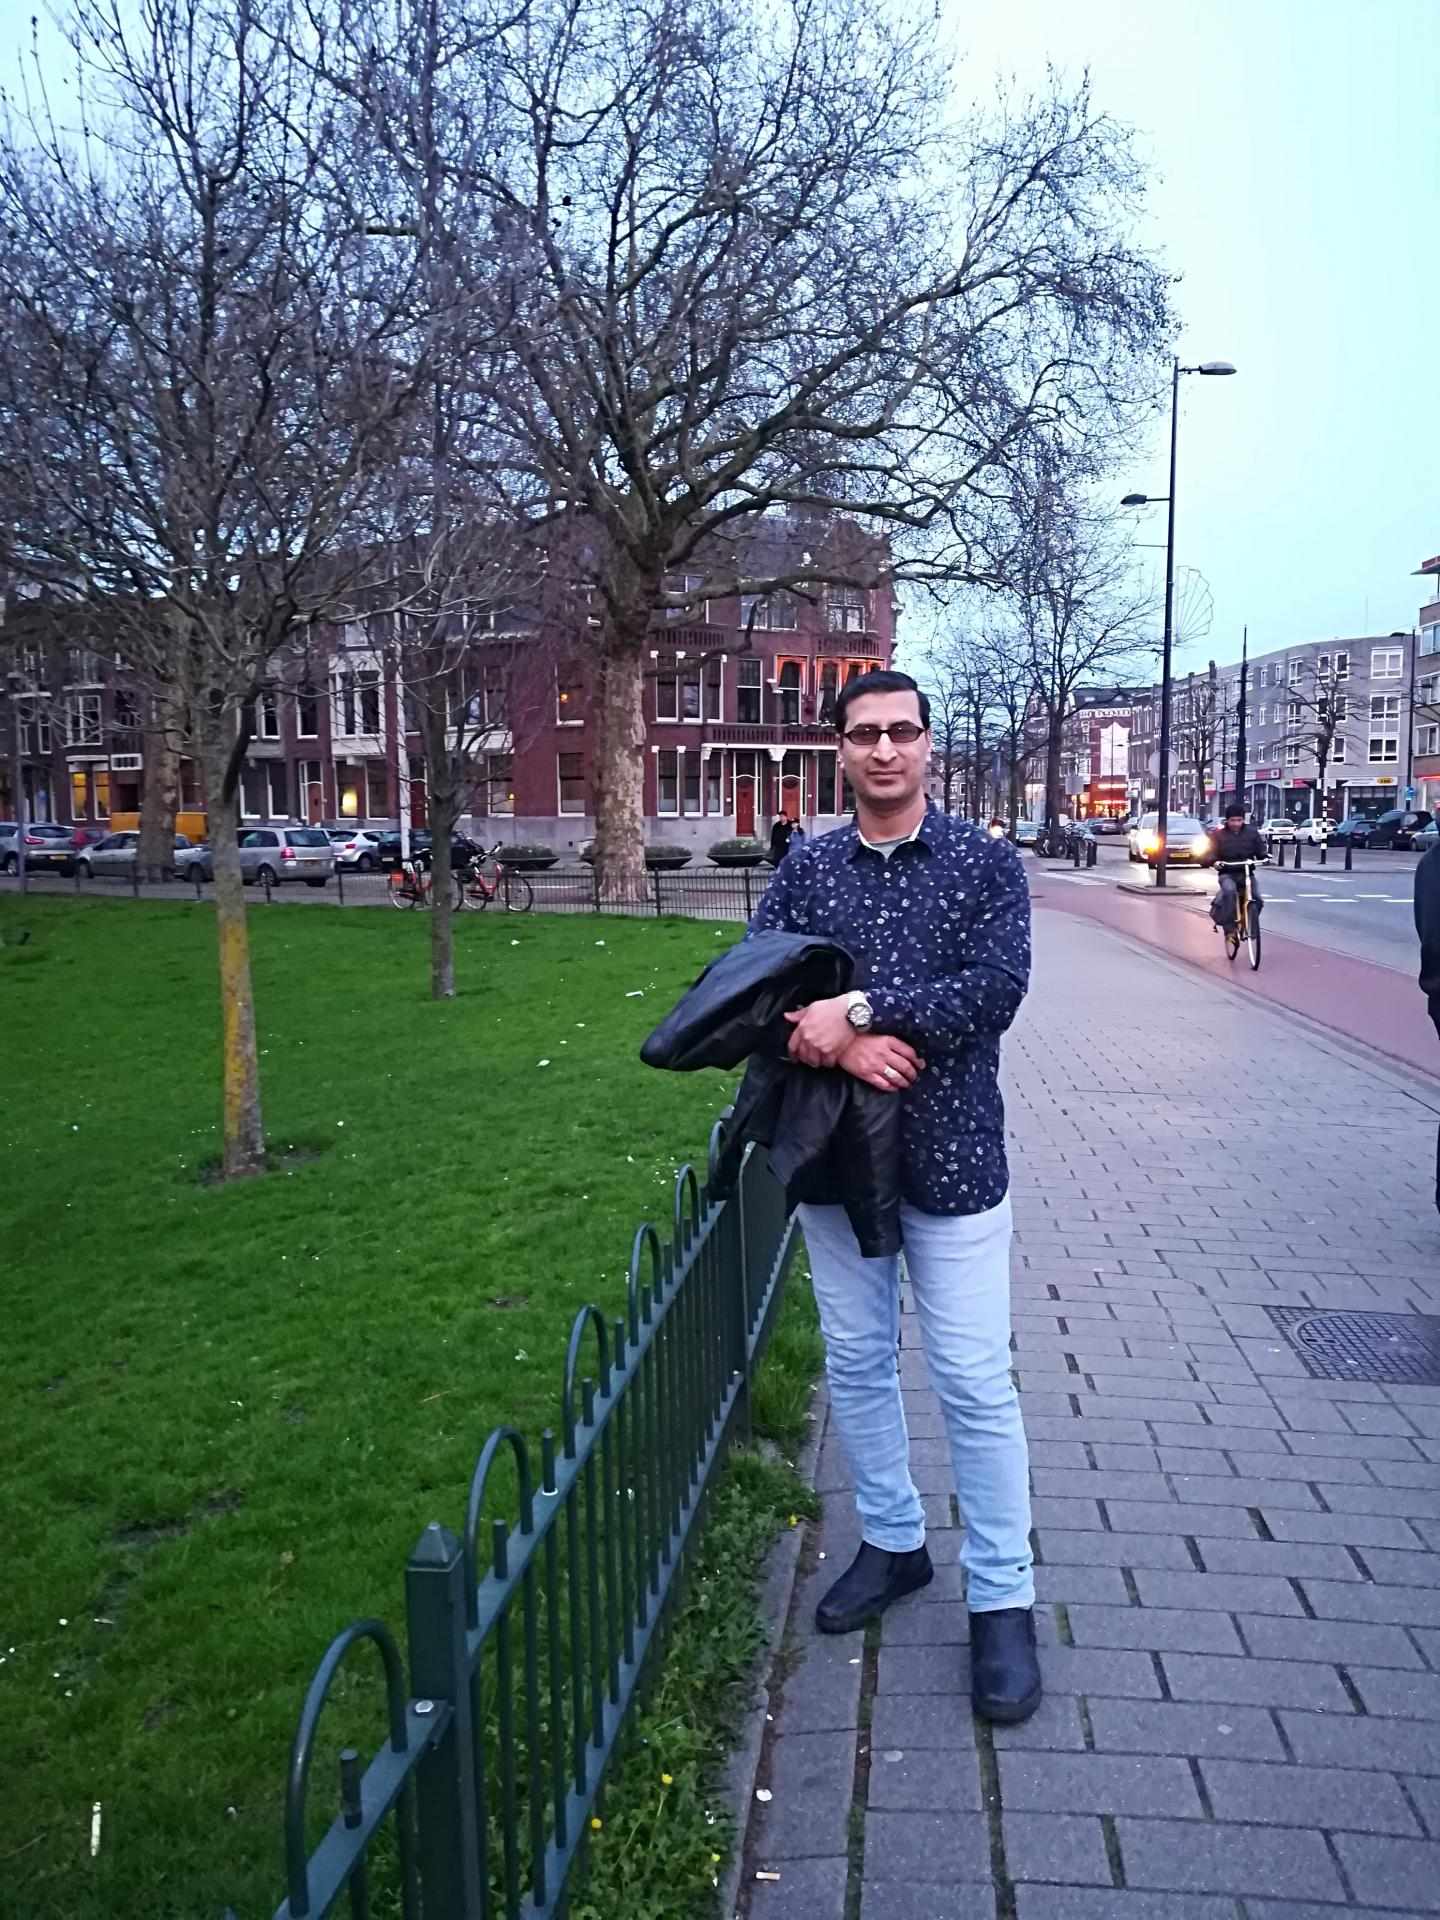 ag007 uit Zuid-Holland,Nederland